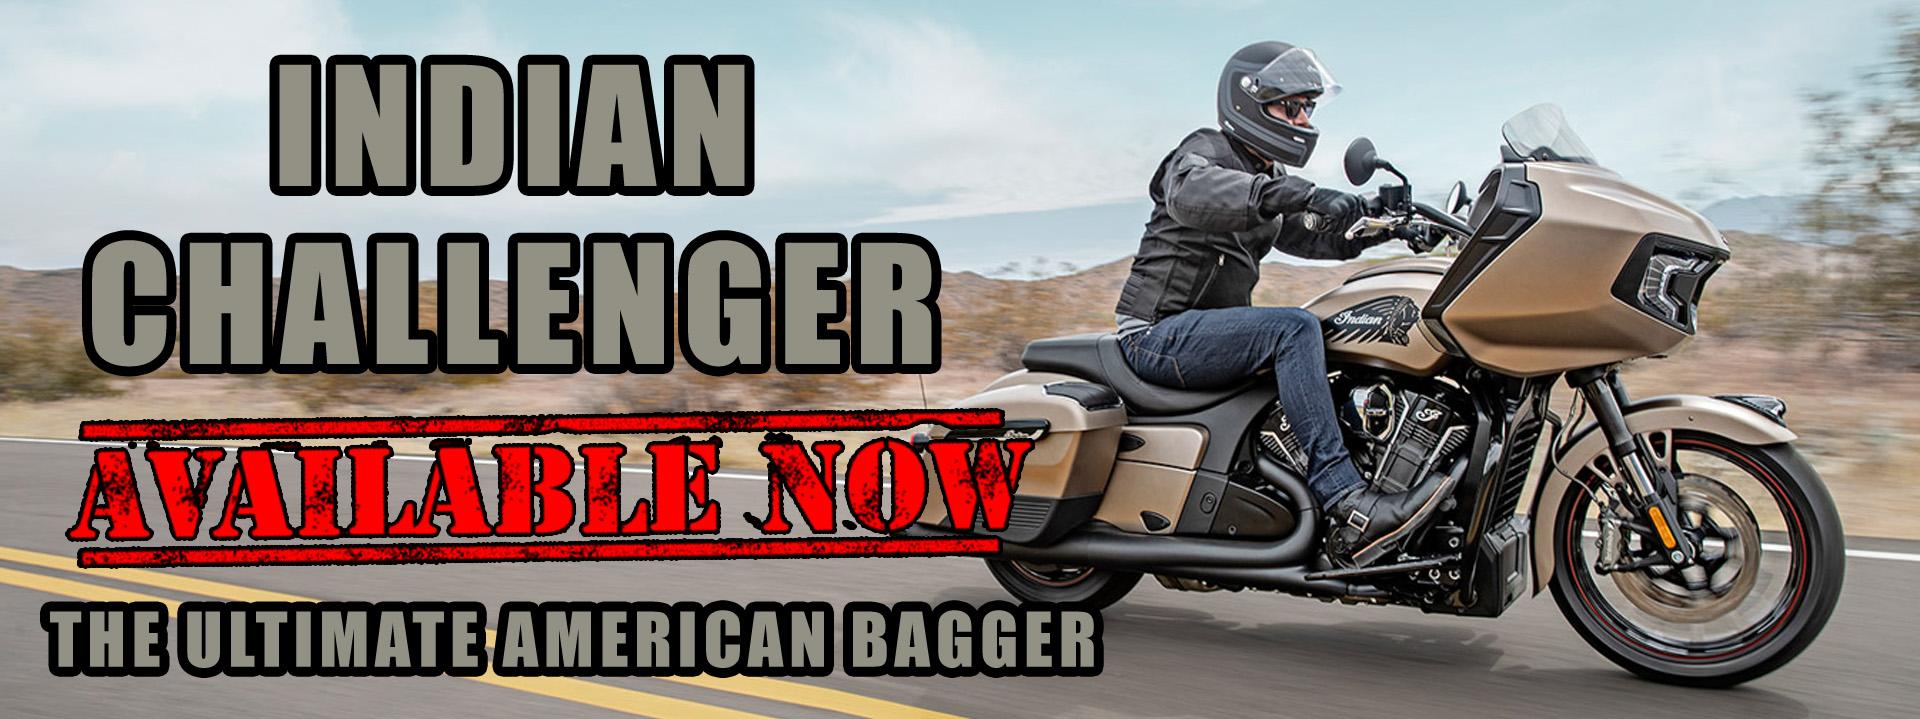 202001 Indian Challenger2